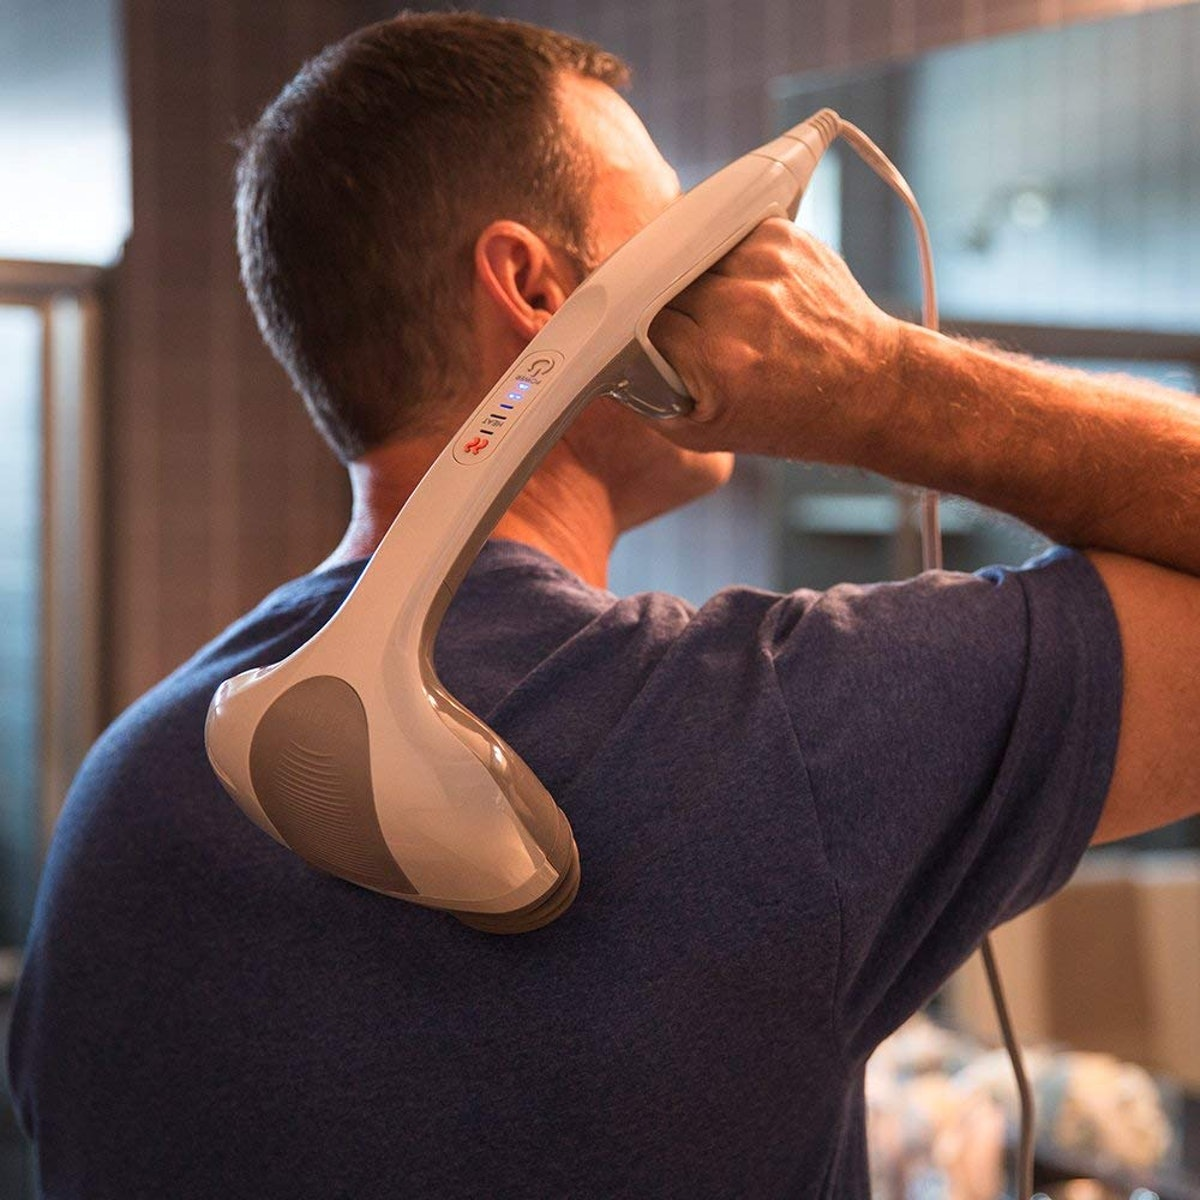 HoMedics Action Massager